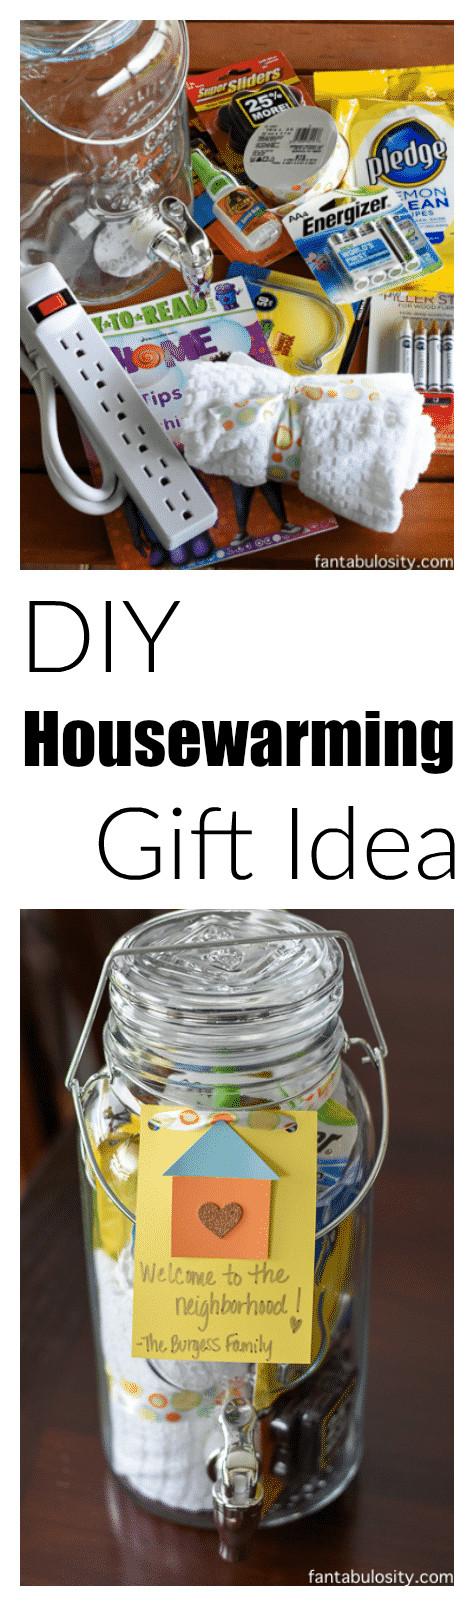 DIY Housewarming Gifts Ideas  DIY Housewarming Gift Idea Drink Dispenser Fantabulosity